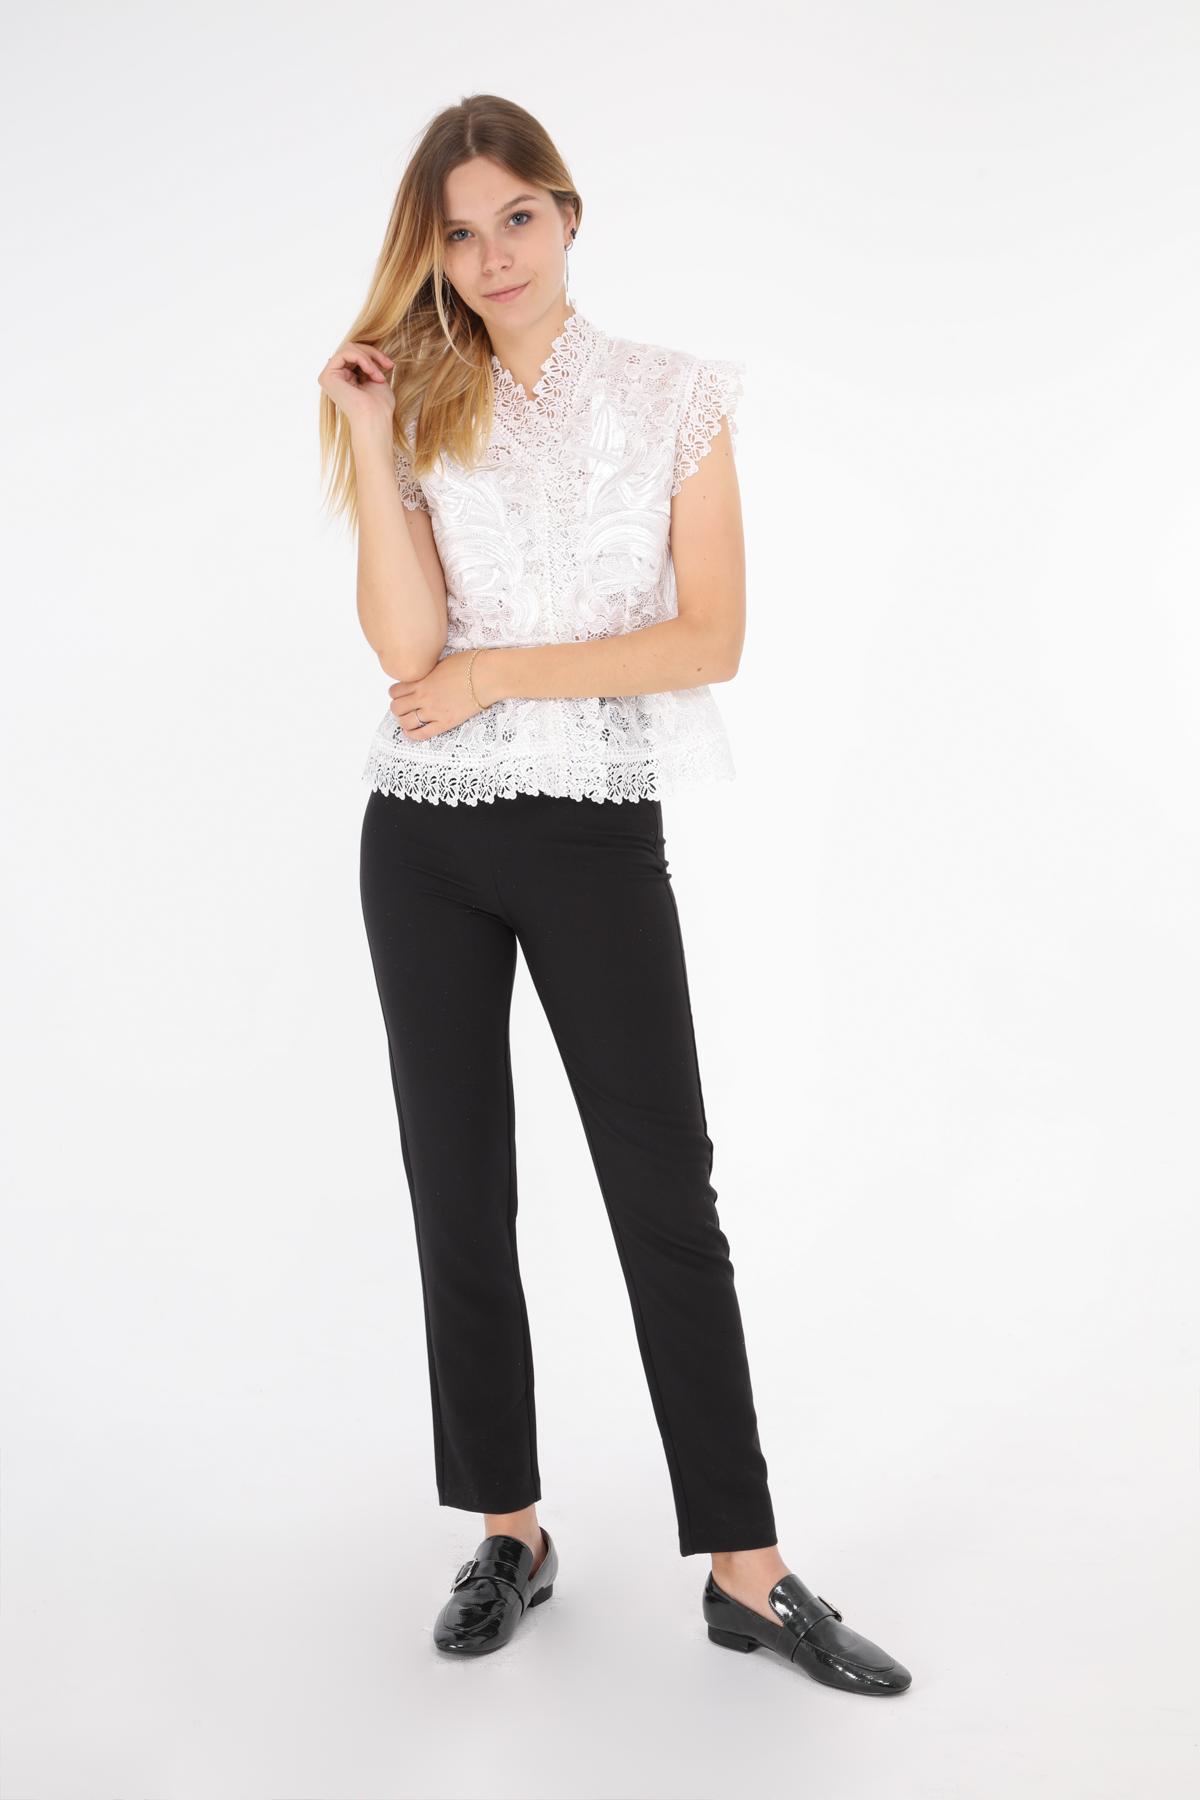 Tops Femme Blanc Lulumary H576 #c eFashion Paris